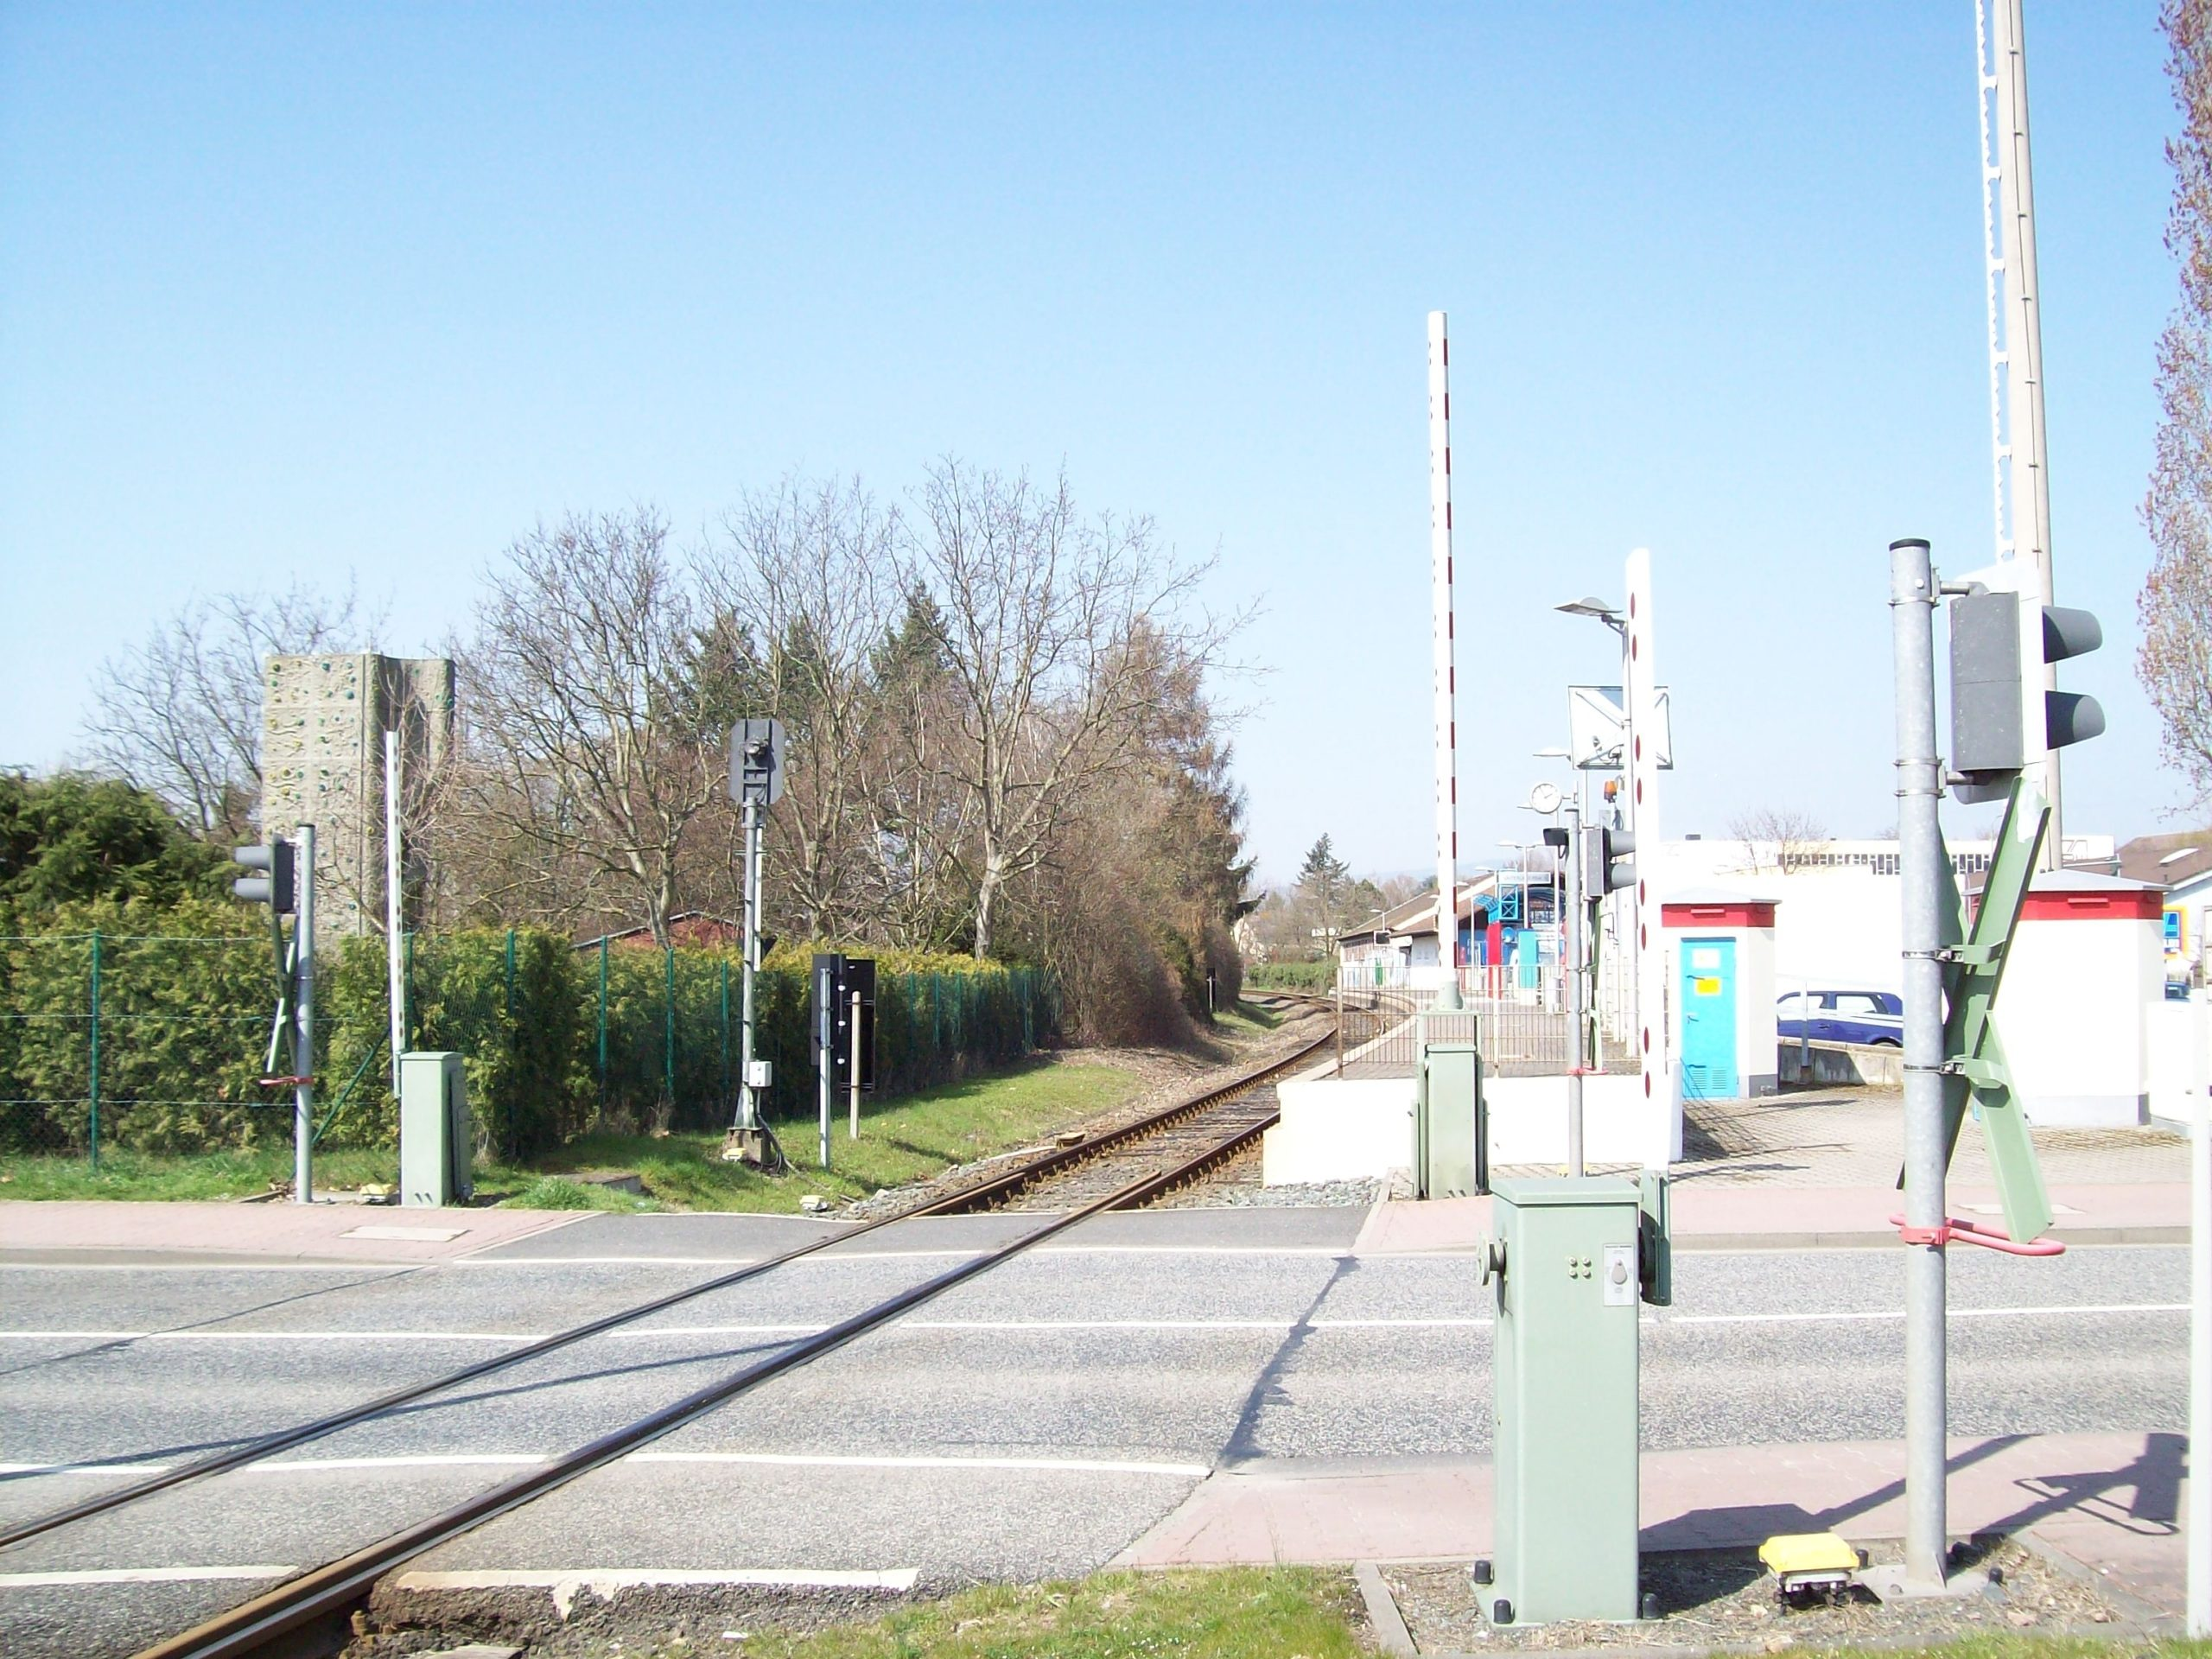 Bahnhof_13